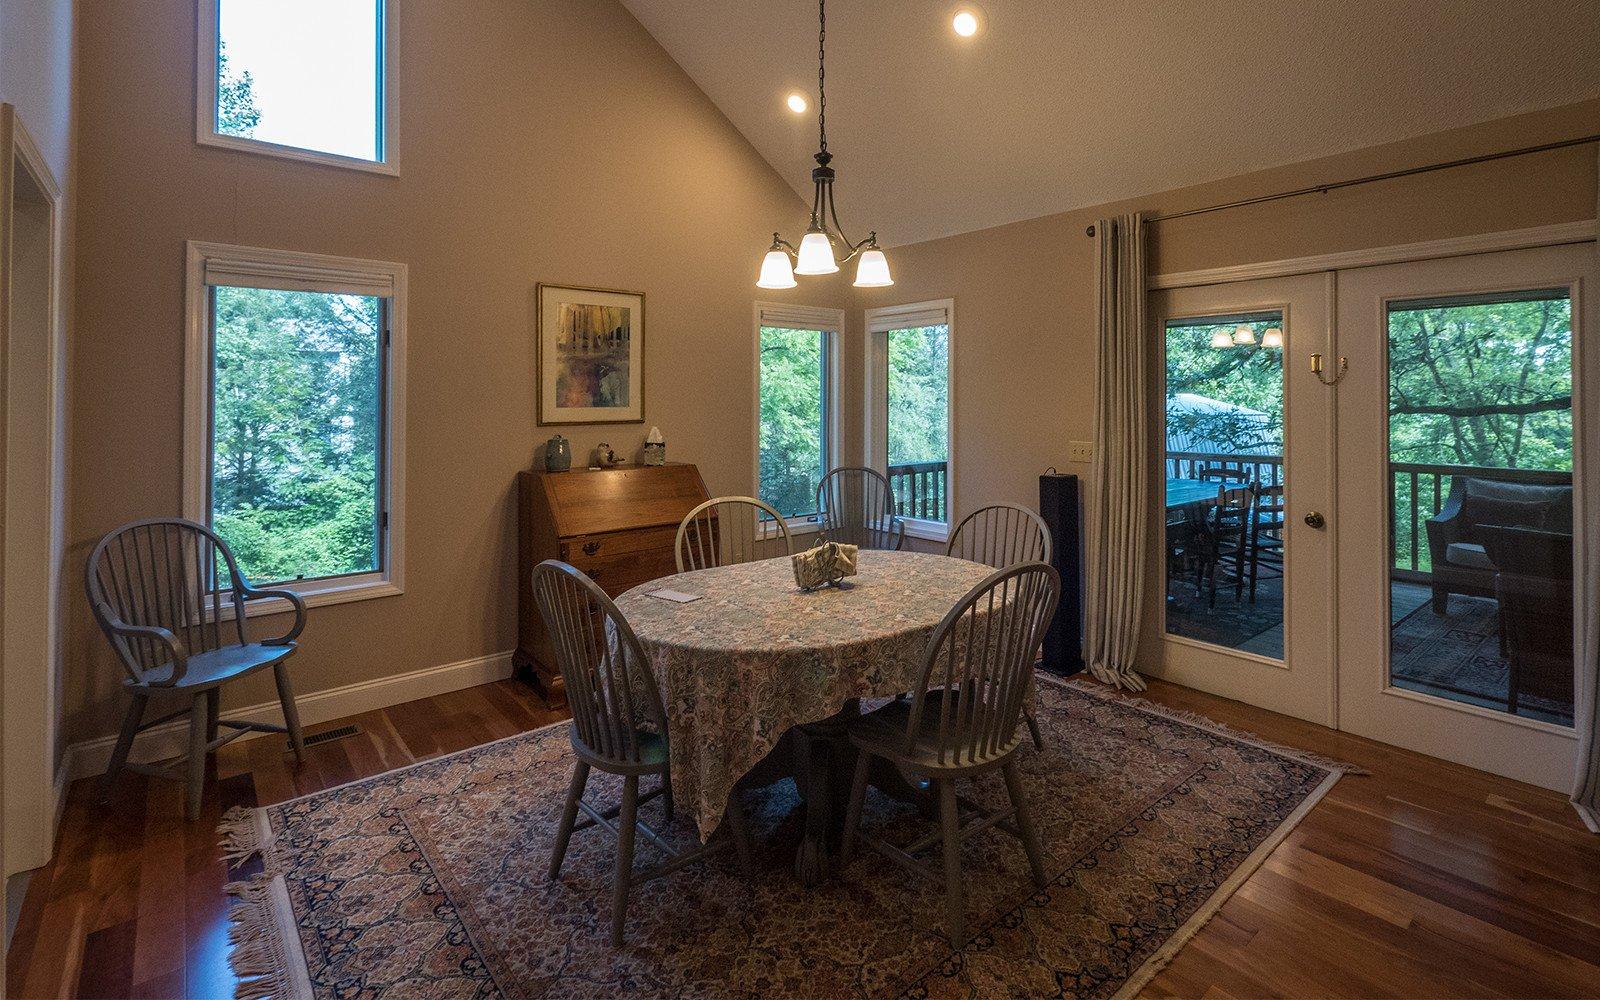 Hilt Street house dining room